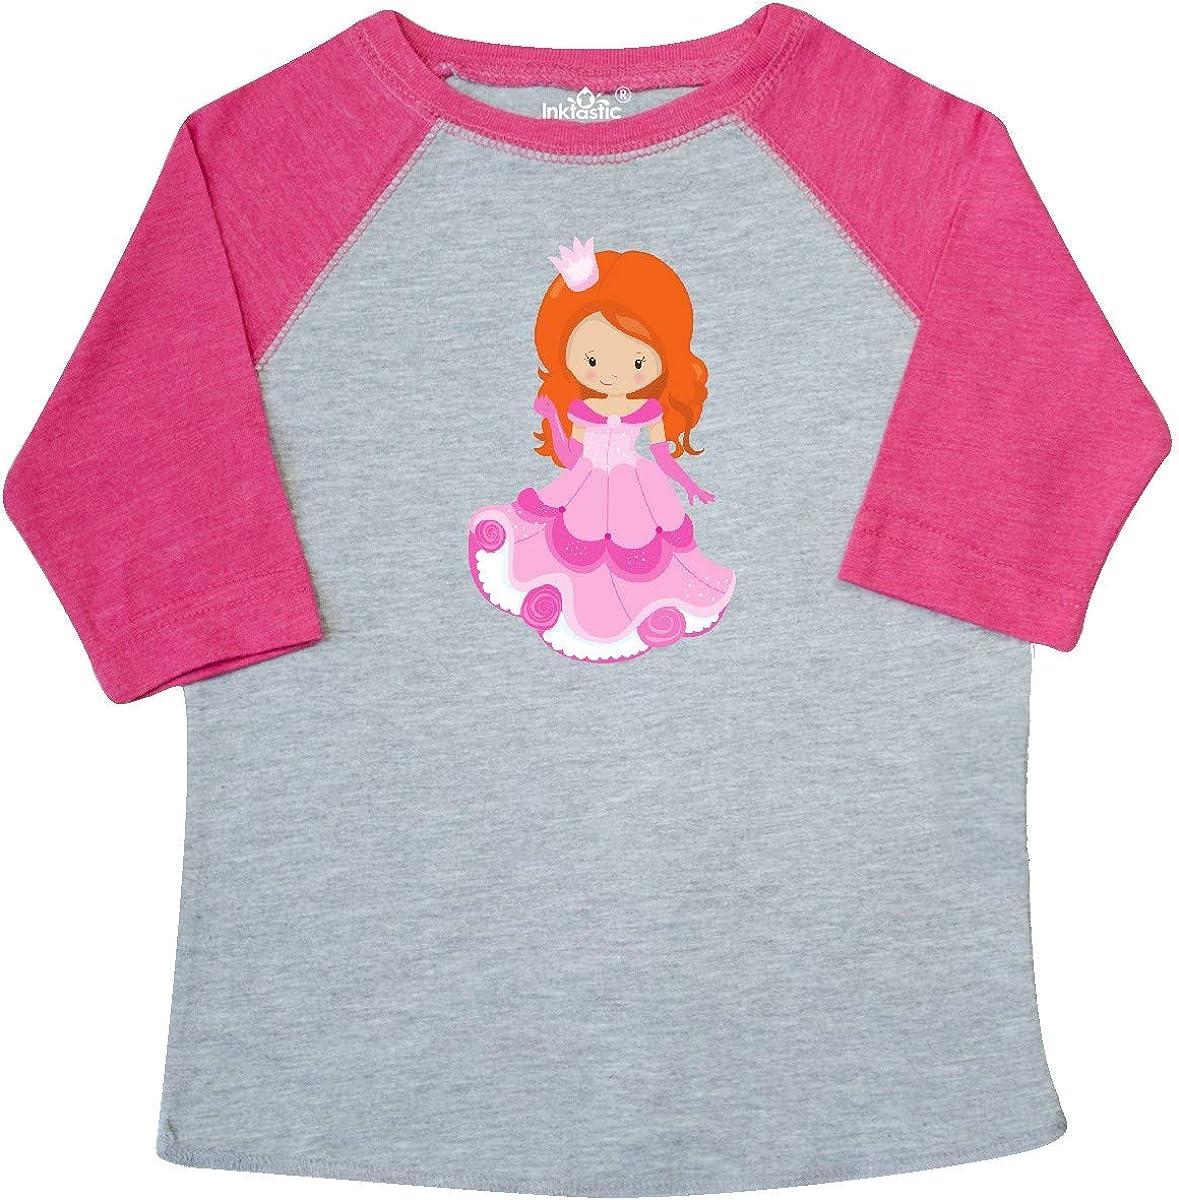 Orange Hair Toddler T-Shirt Princess in Pink Dress inktastic Cute Princess